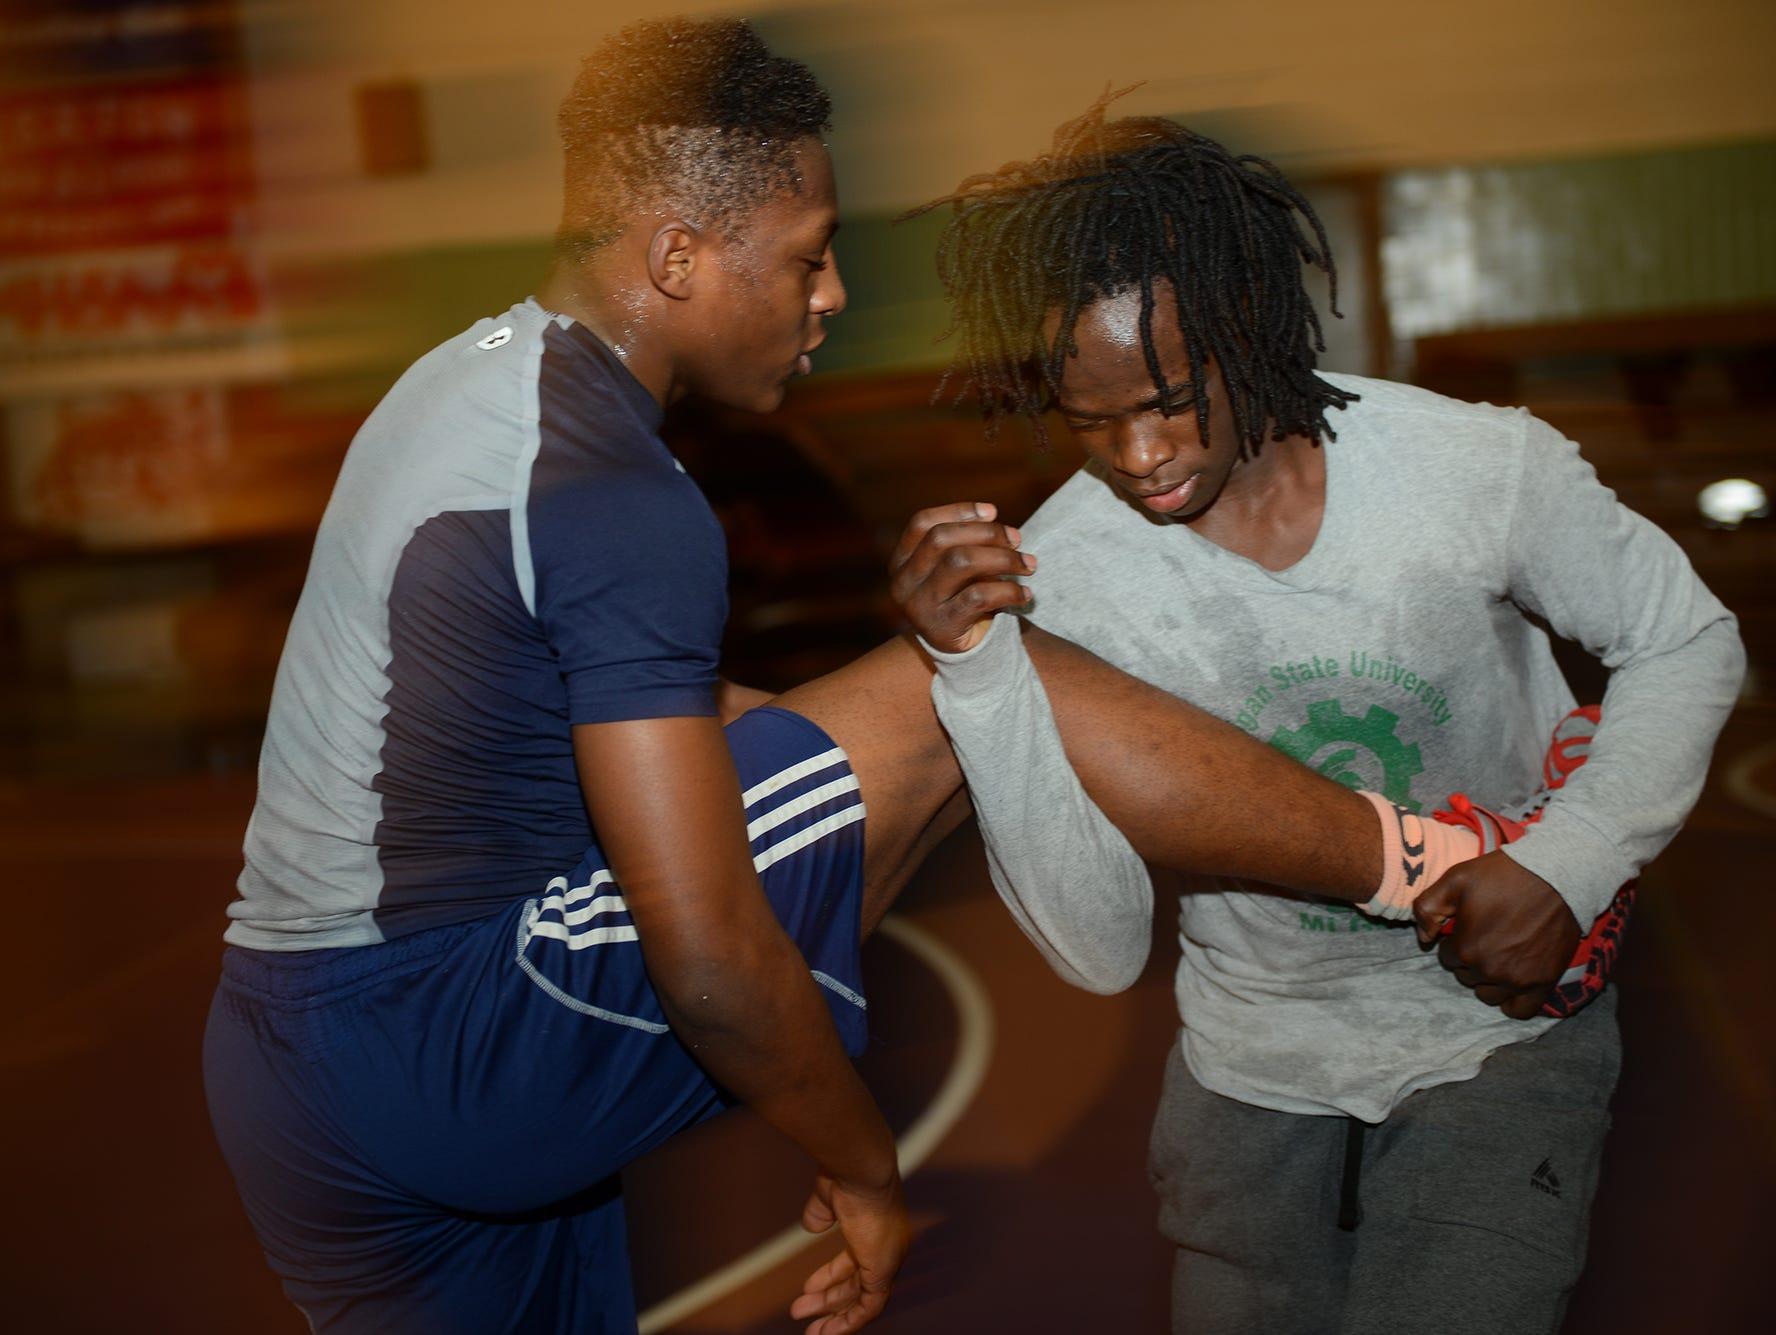 Wrestlers Kedrick Tegue, left, and Ibrahim Mkumbukwa run drills on Tuesday, Feb. 7, 2017 at Sexton High School.